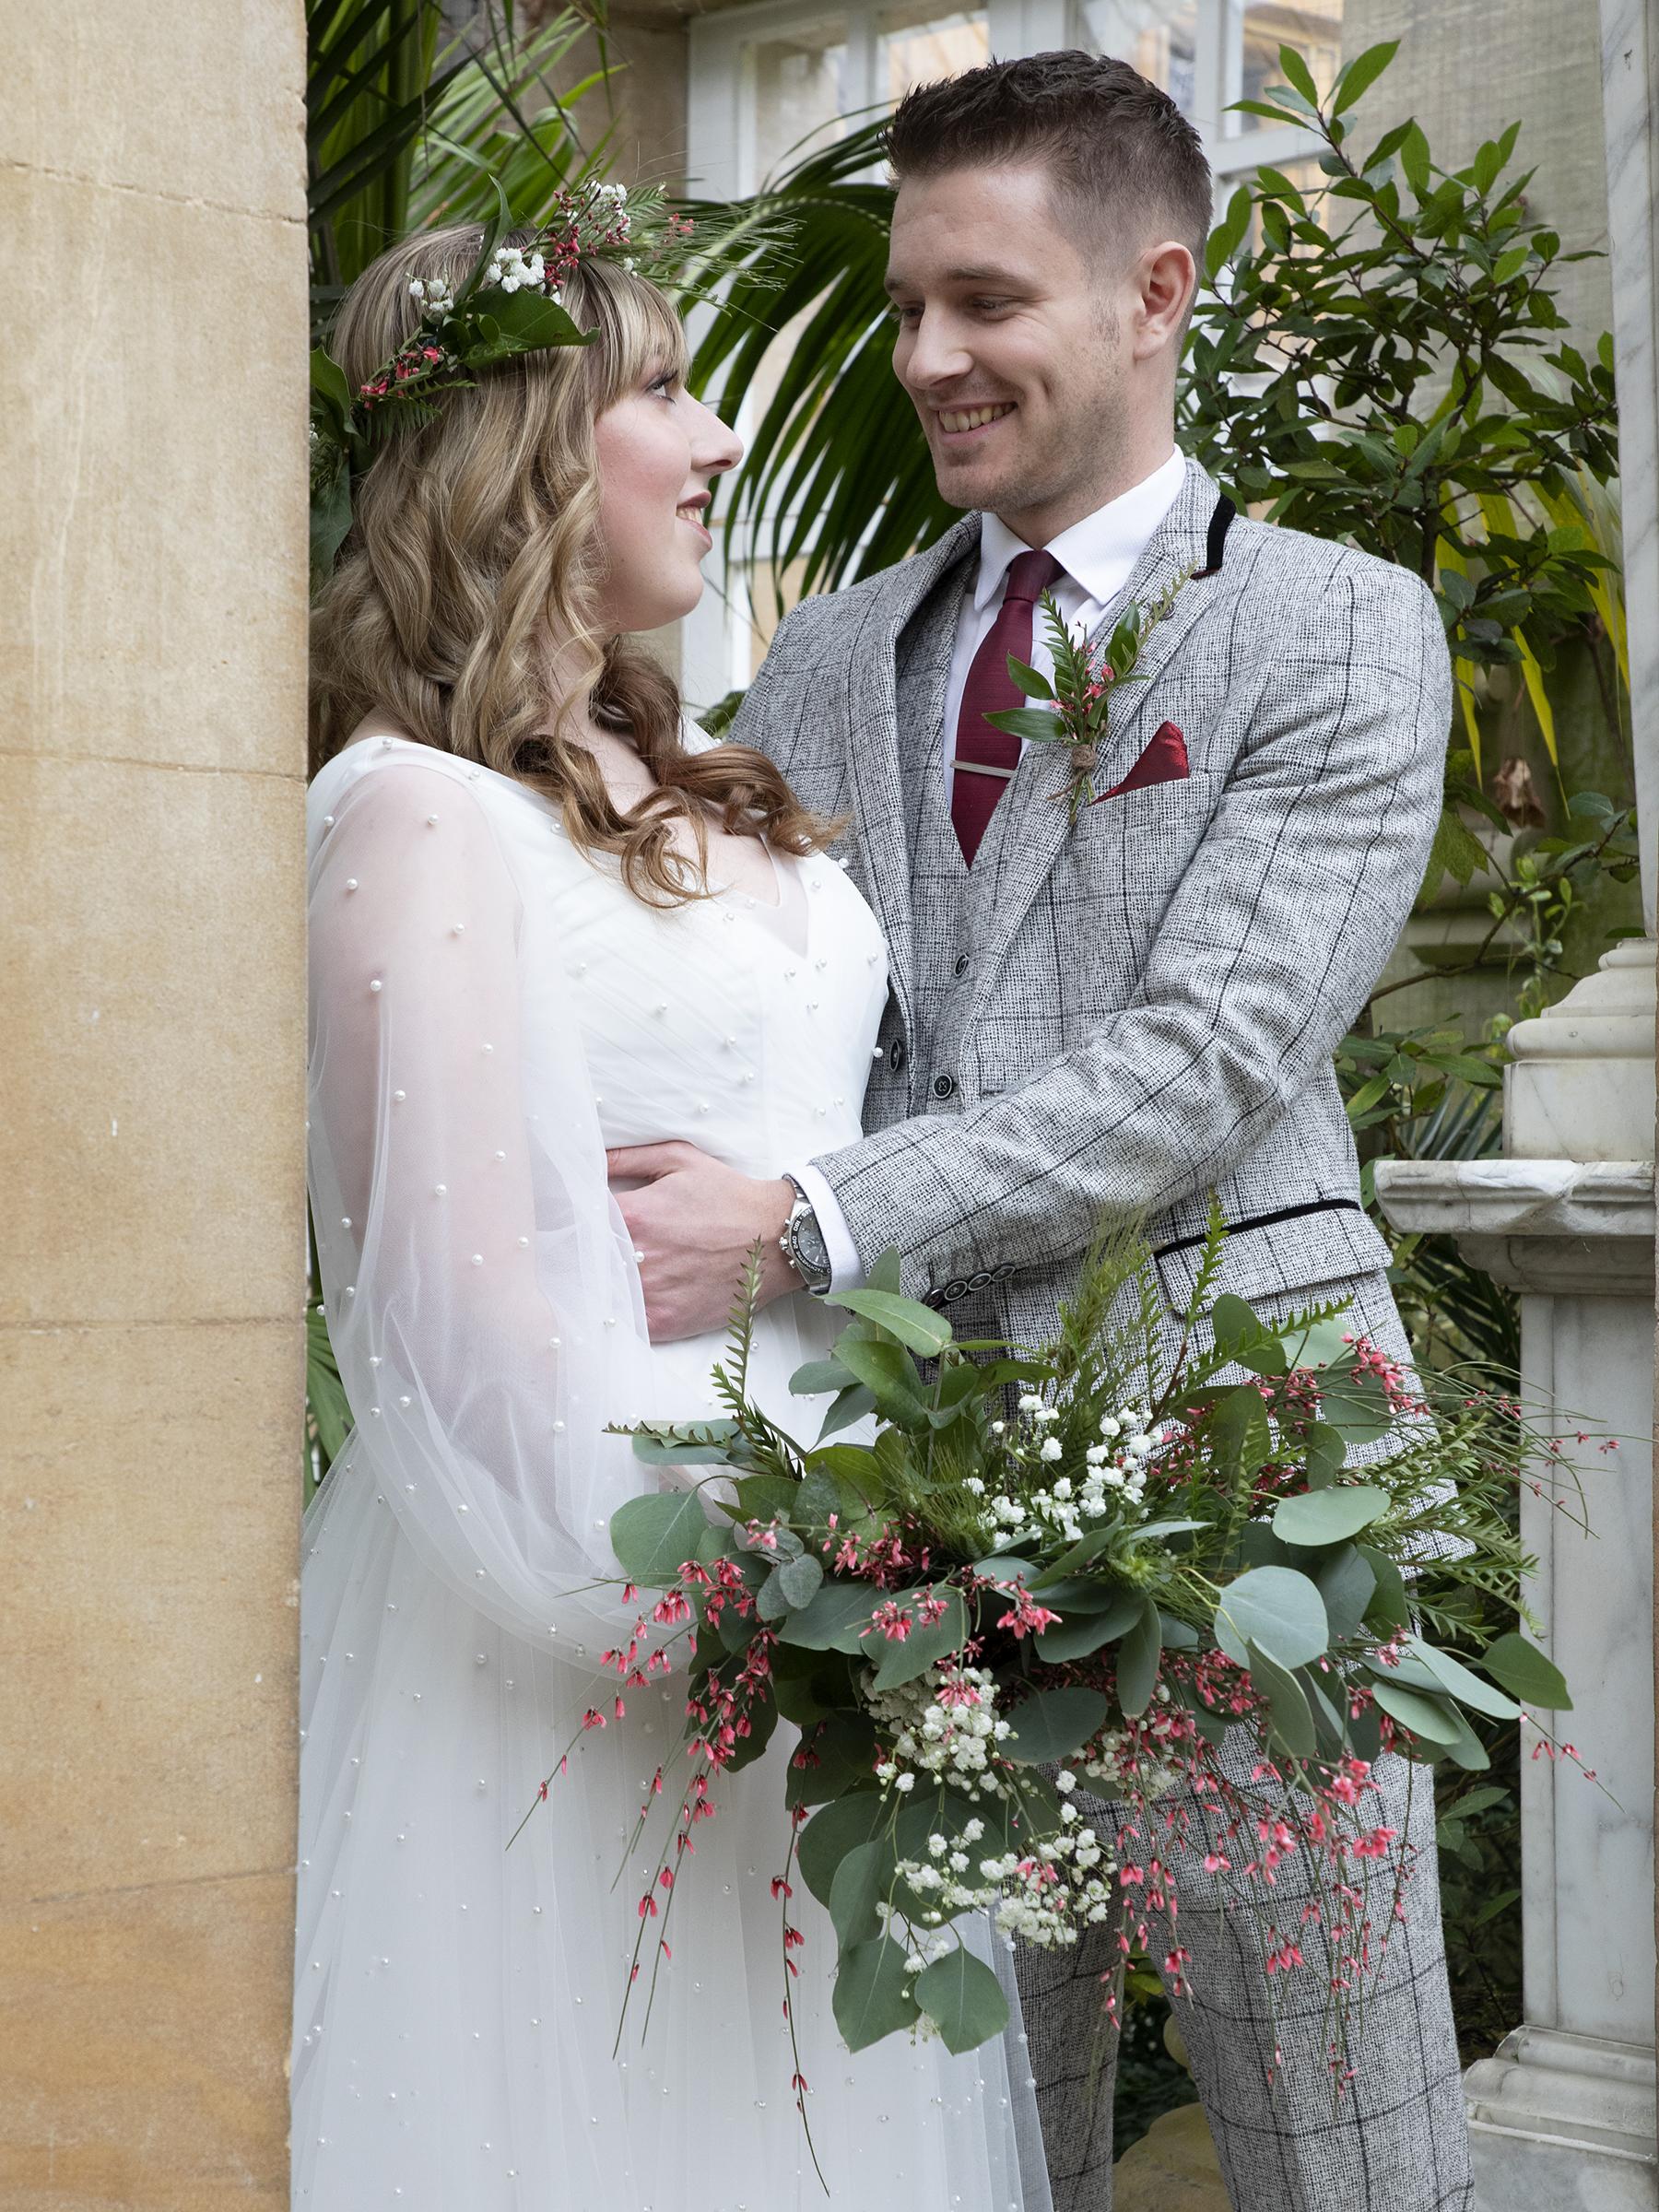 Tropical Boho Wedding- Pink Photographics- Greenhouse Wedding- Harlaxton Wedding- Unconventional Wedding- Unique Wedding Ideas 16